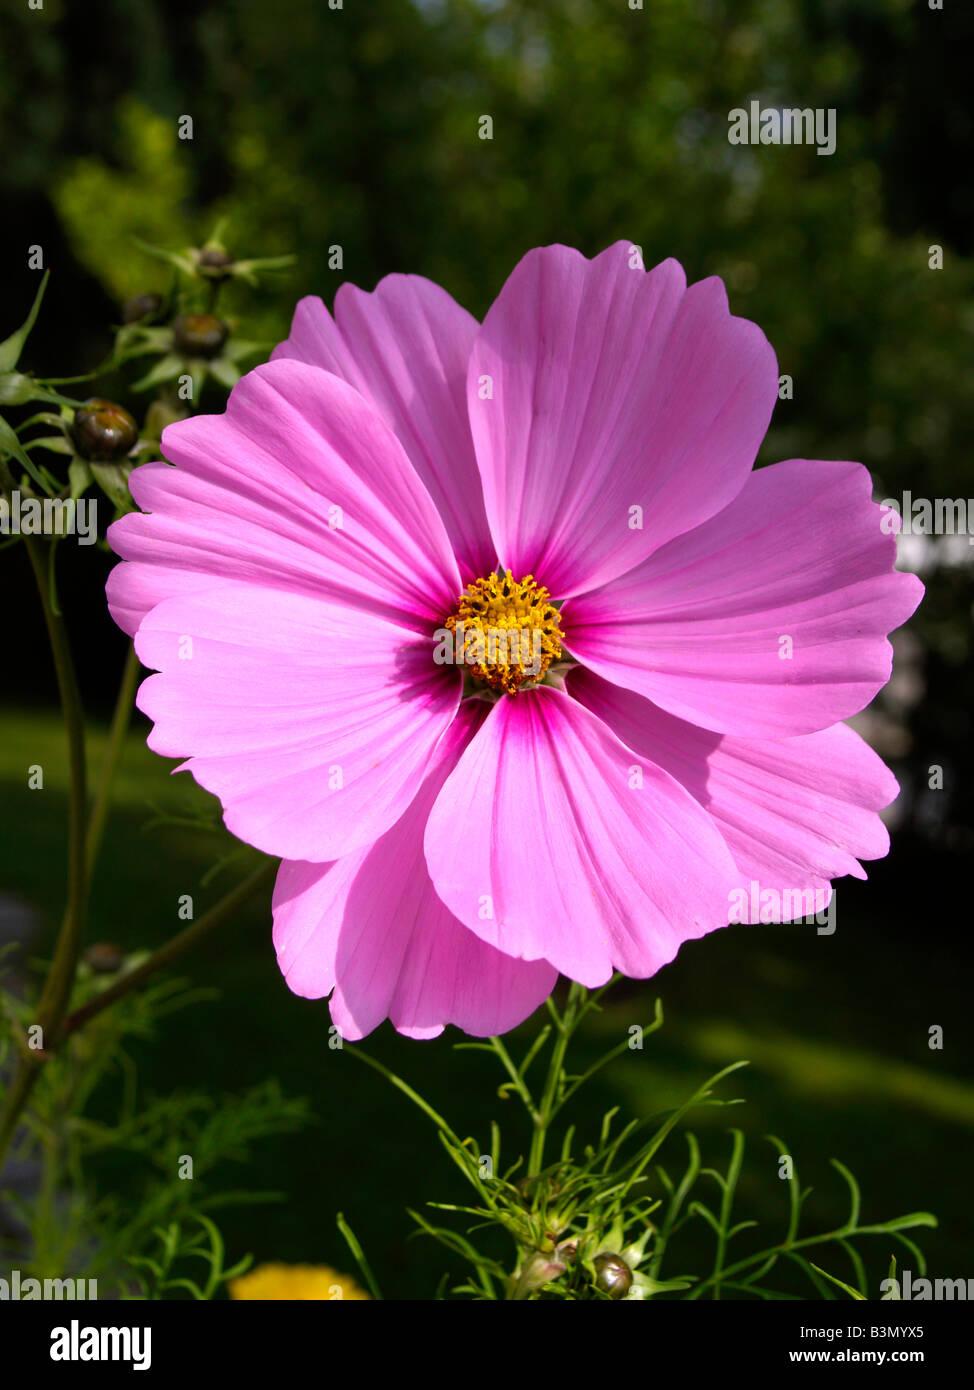 Schnittblumen Immagini Schnittblumen Fotos Stock Alamy